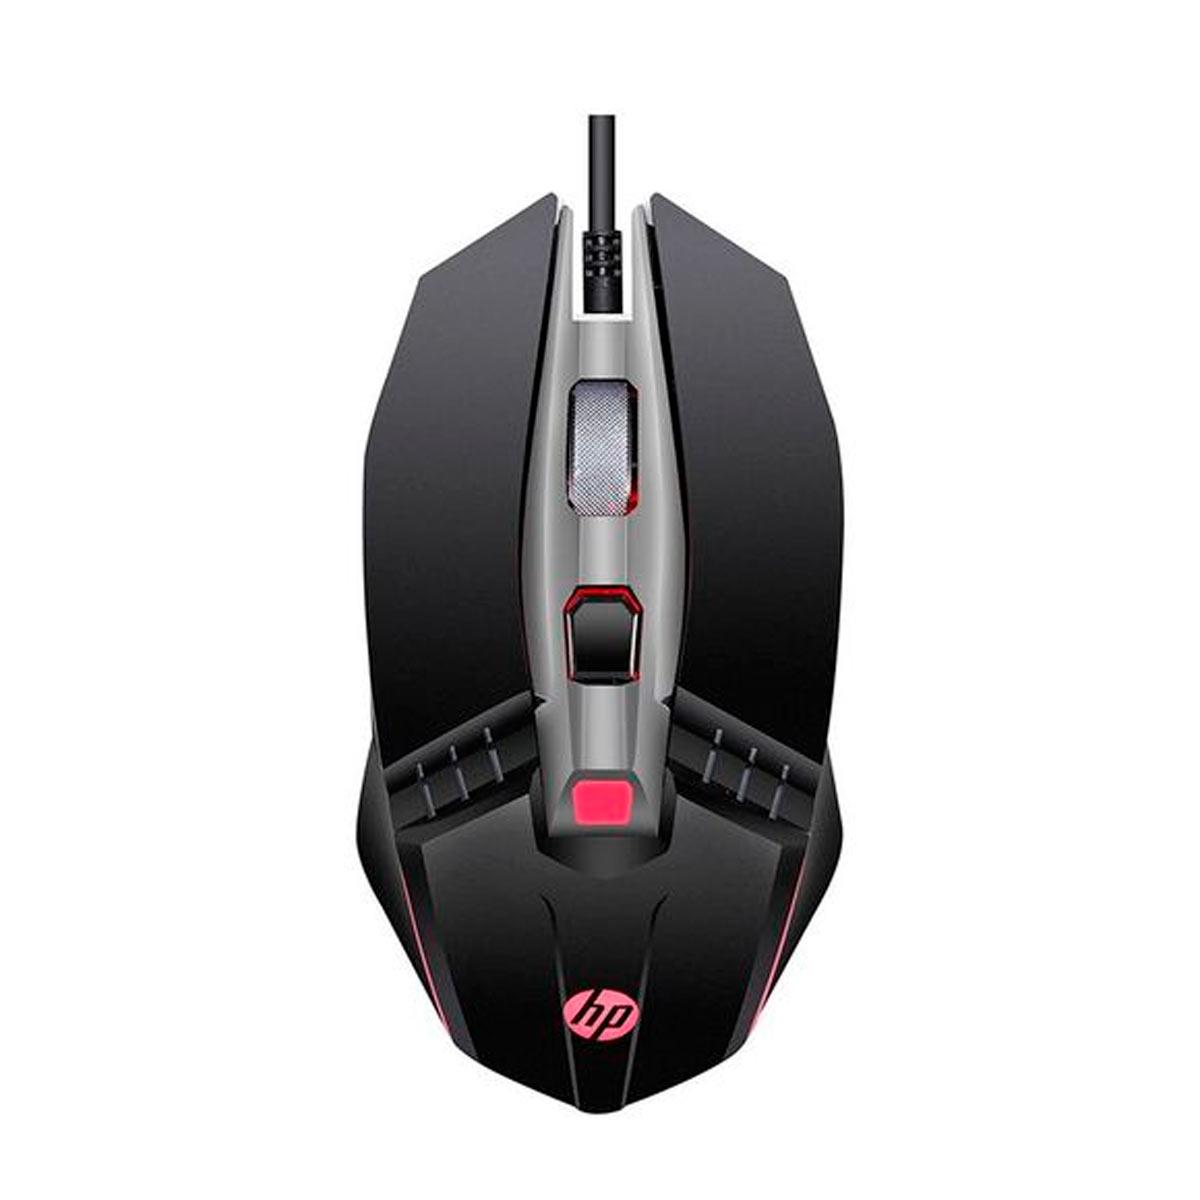 Mouse Gamer USB M270 2400 DPI LED BLACK